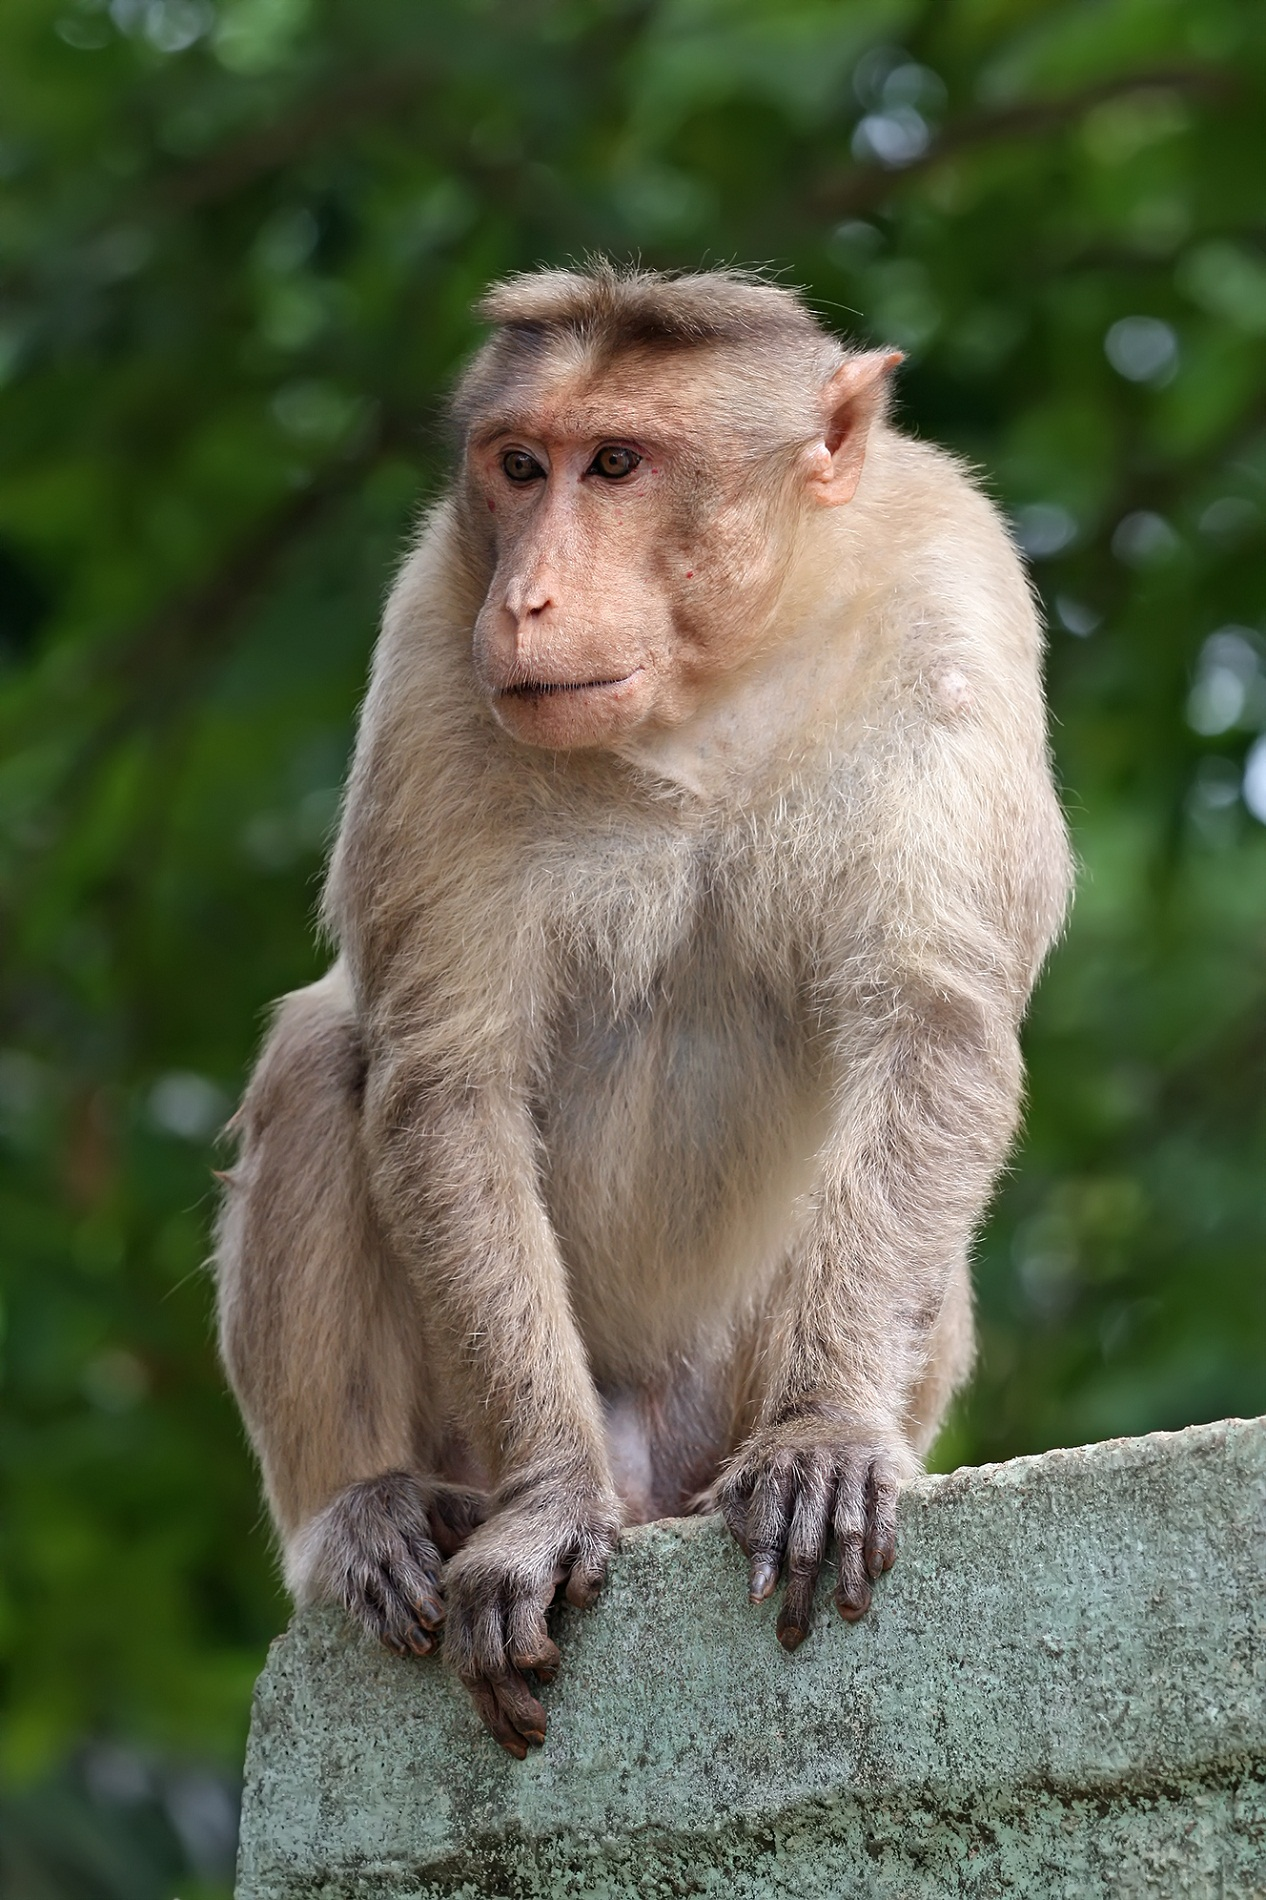 images of monkeys new